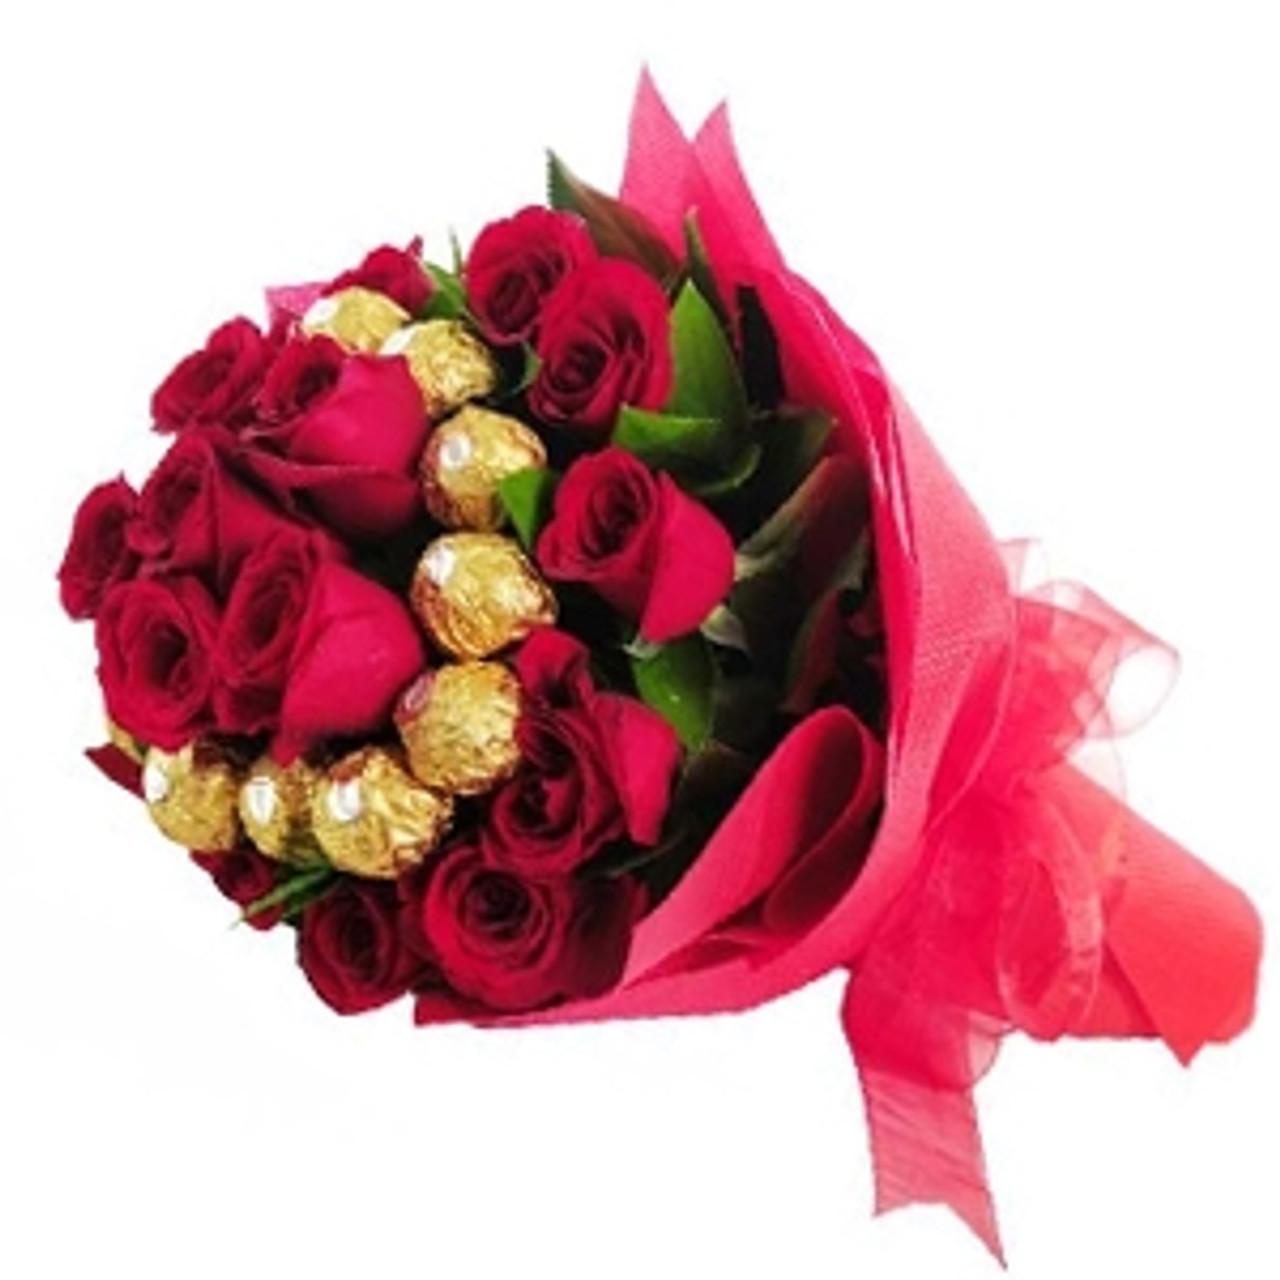 20 XL Roses & 10 Ferrero Bouquet